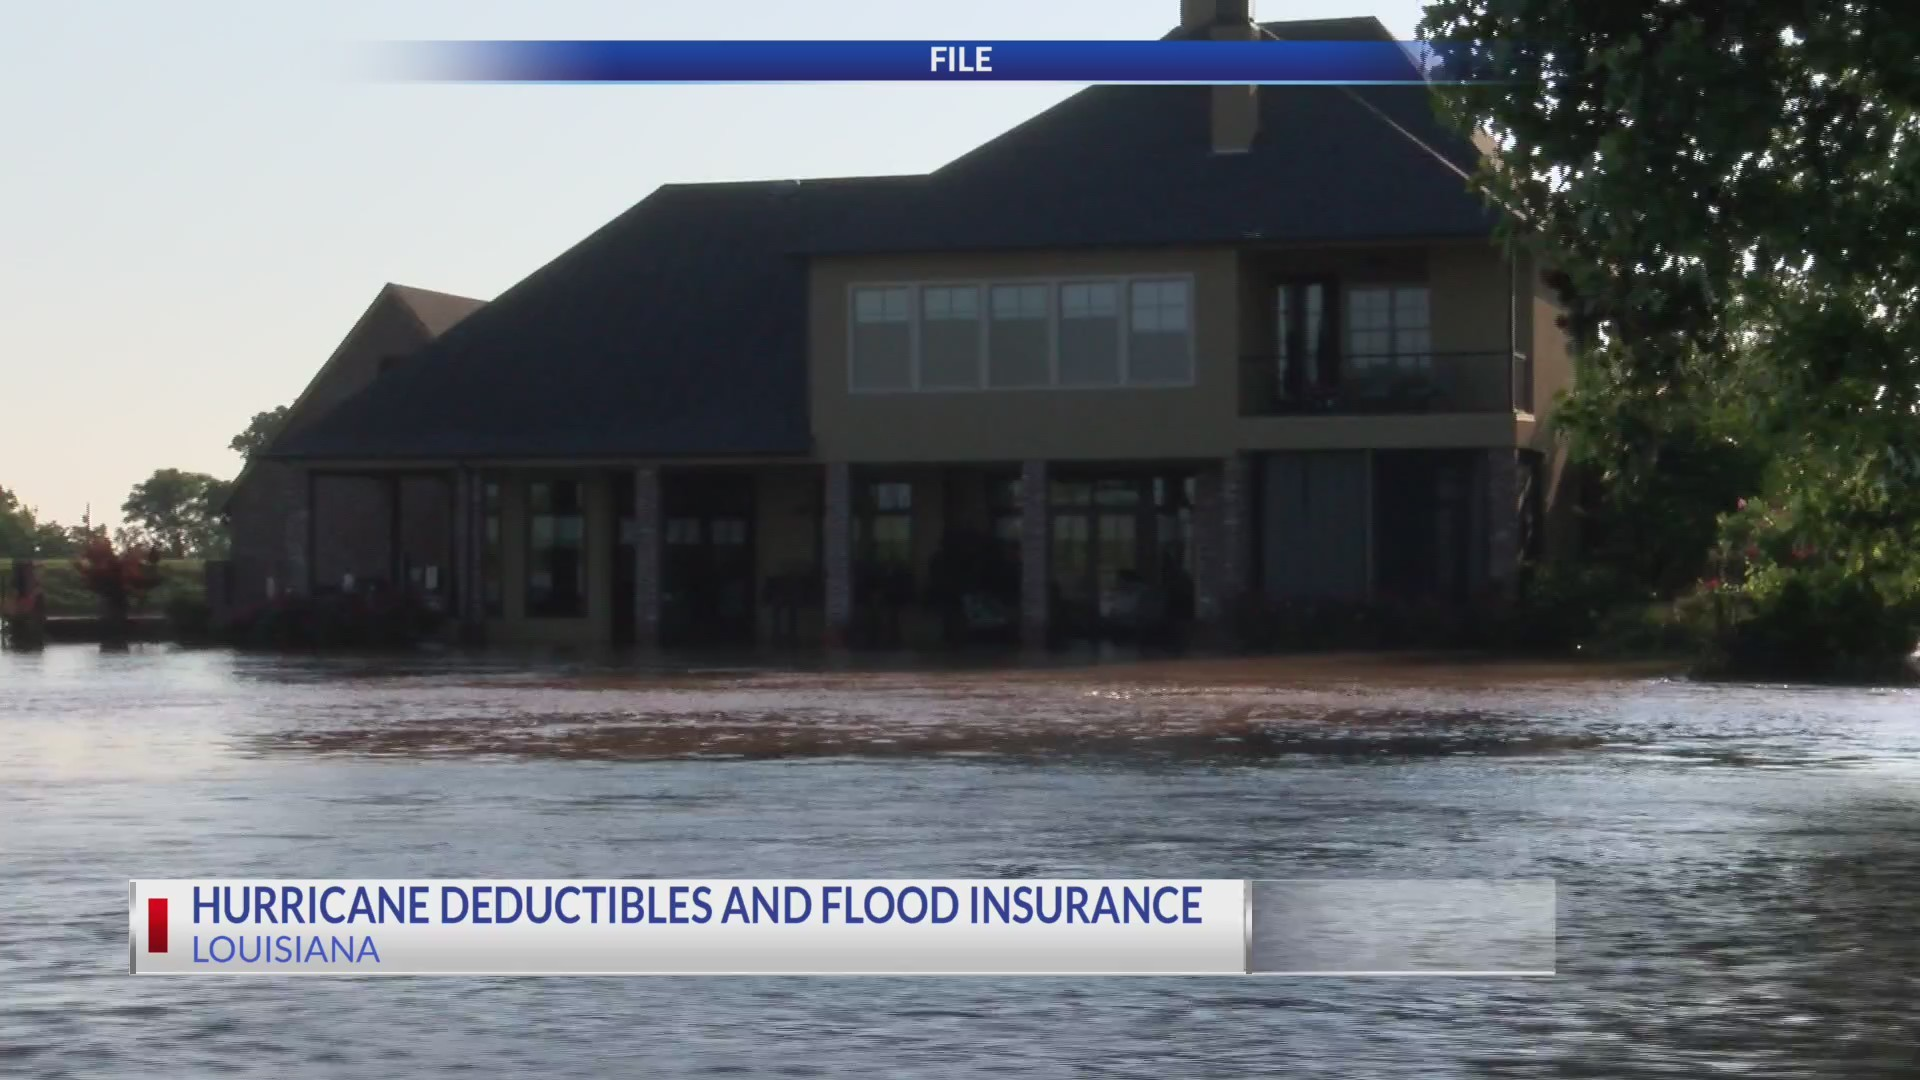 La Insurance Commissioner talks hurricane deductible and flood insurance